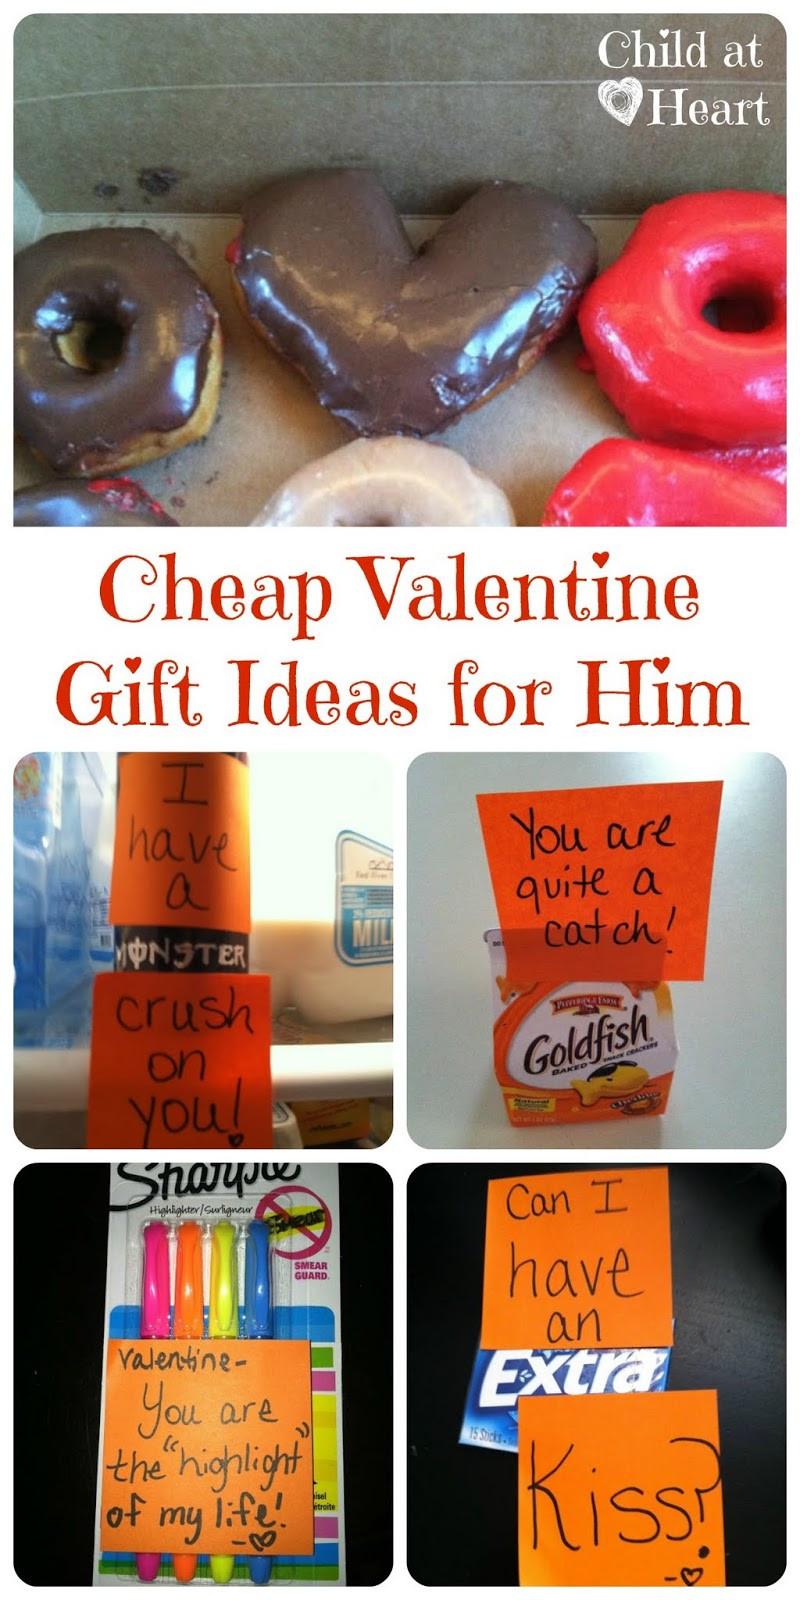 Diy Valentine Gift Ideas For Him  Cheap Valentine Gift Ideas for Him Child at Heart Blog